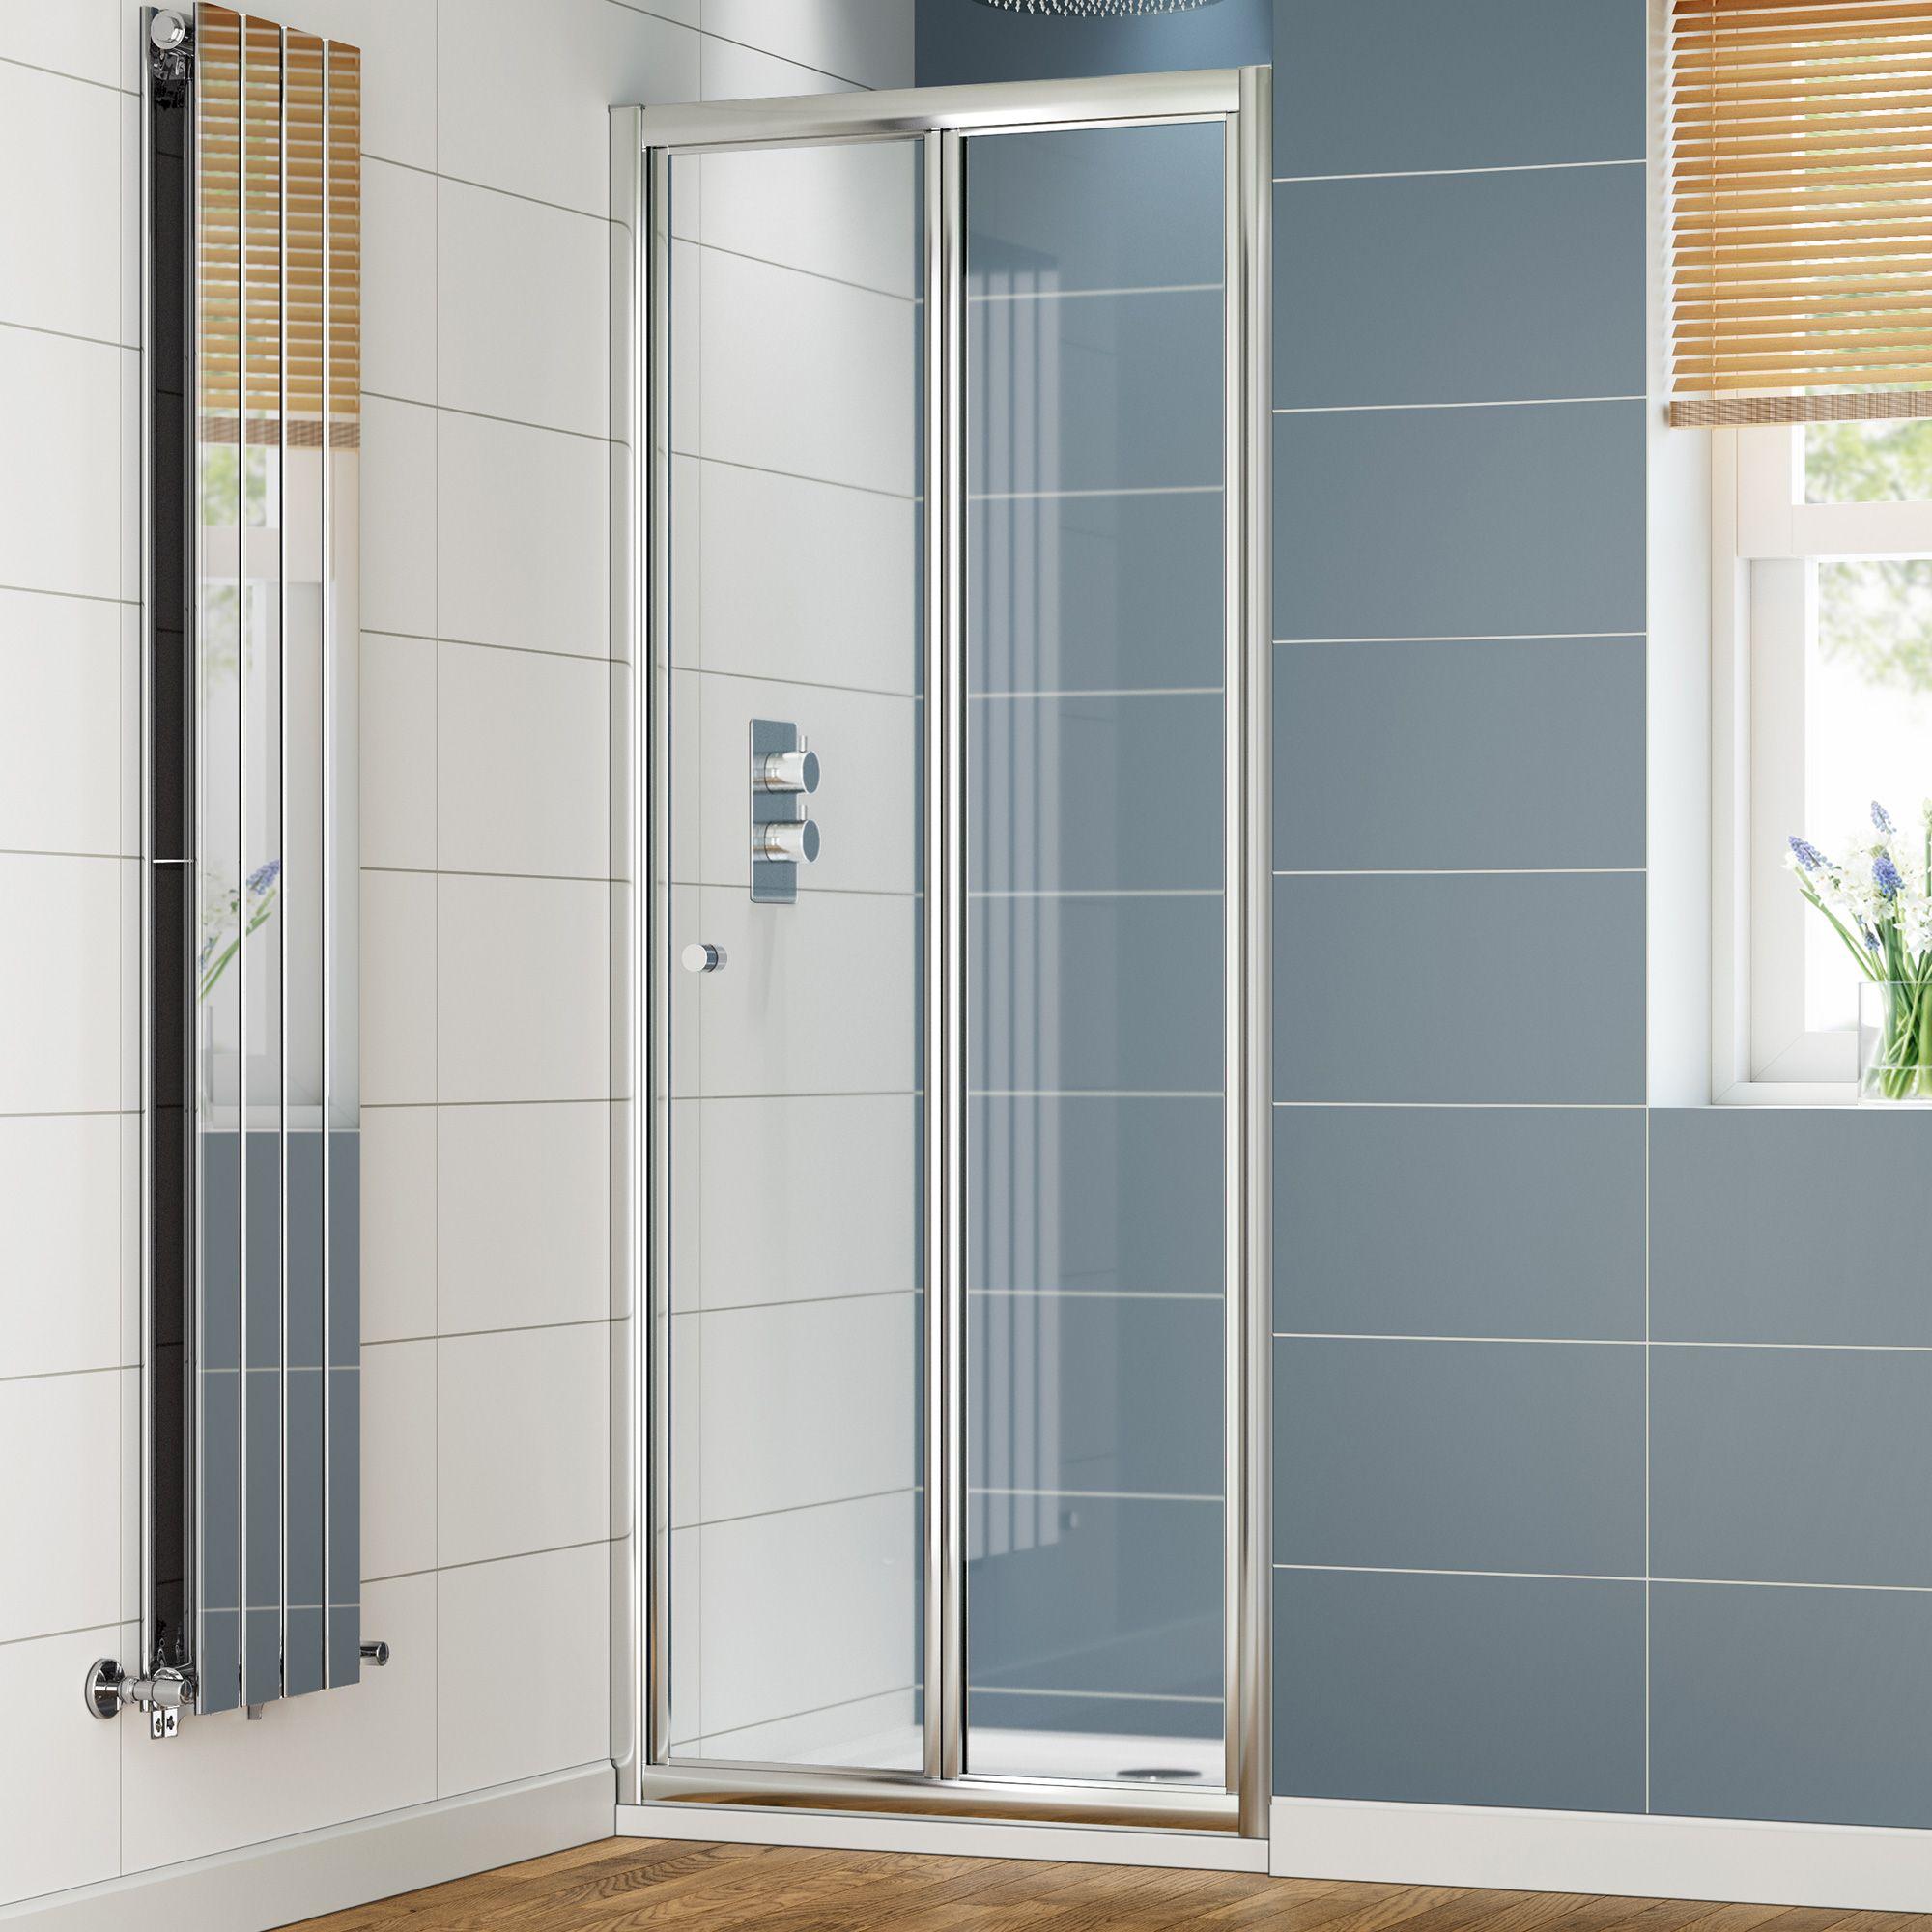 1000mm Elements Bi Fold Shower Door Bifold Shower Door Shower Enclosure Glass Shower Enclosures